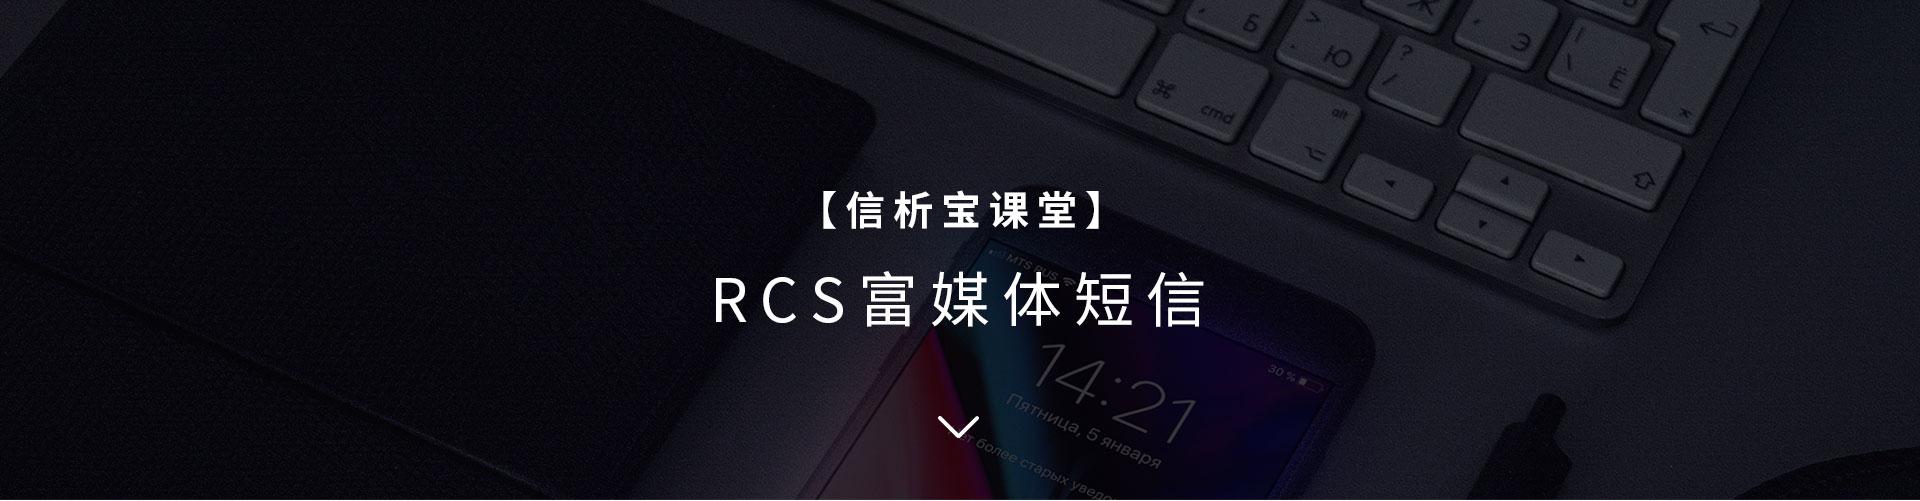 RCS富媒體短信